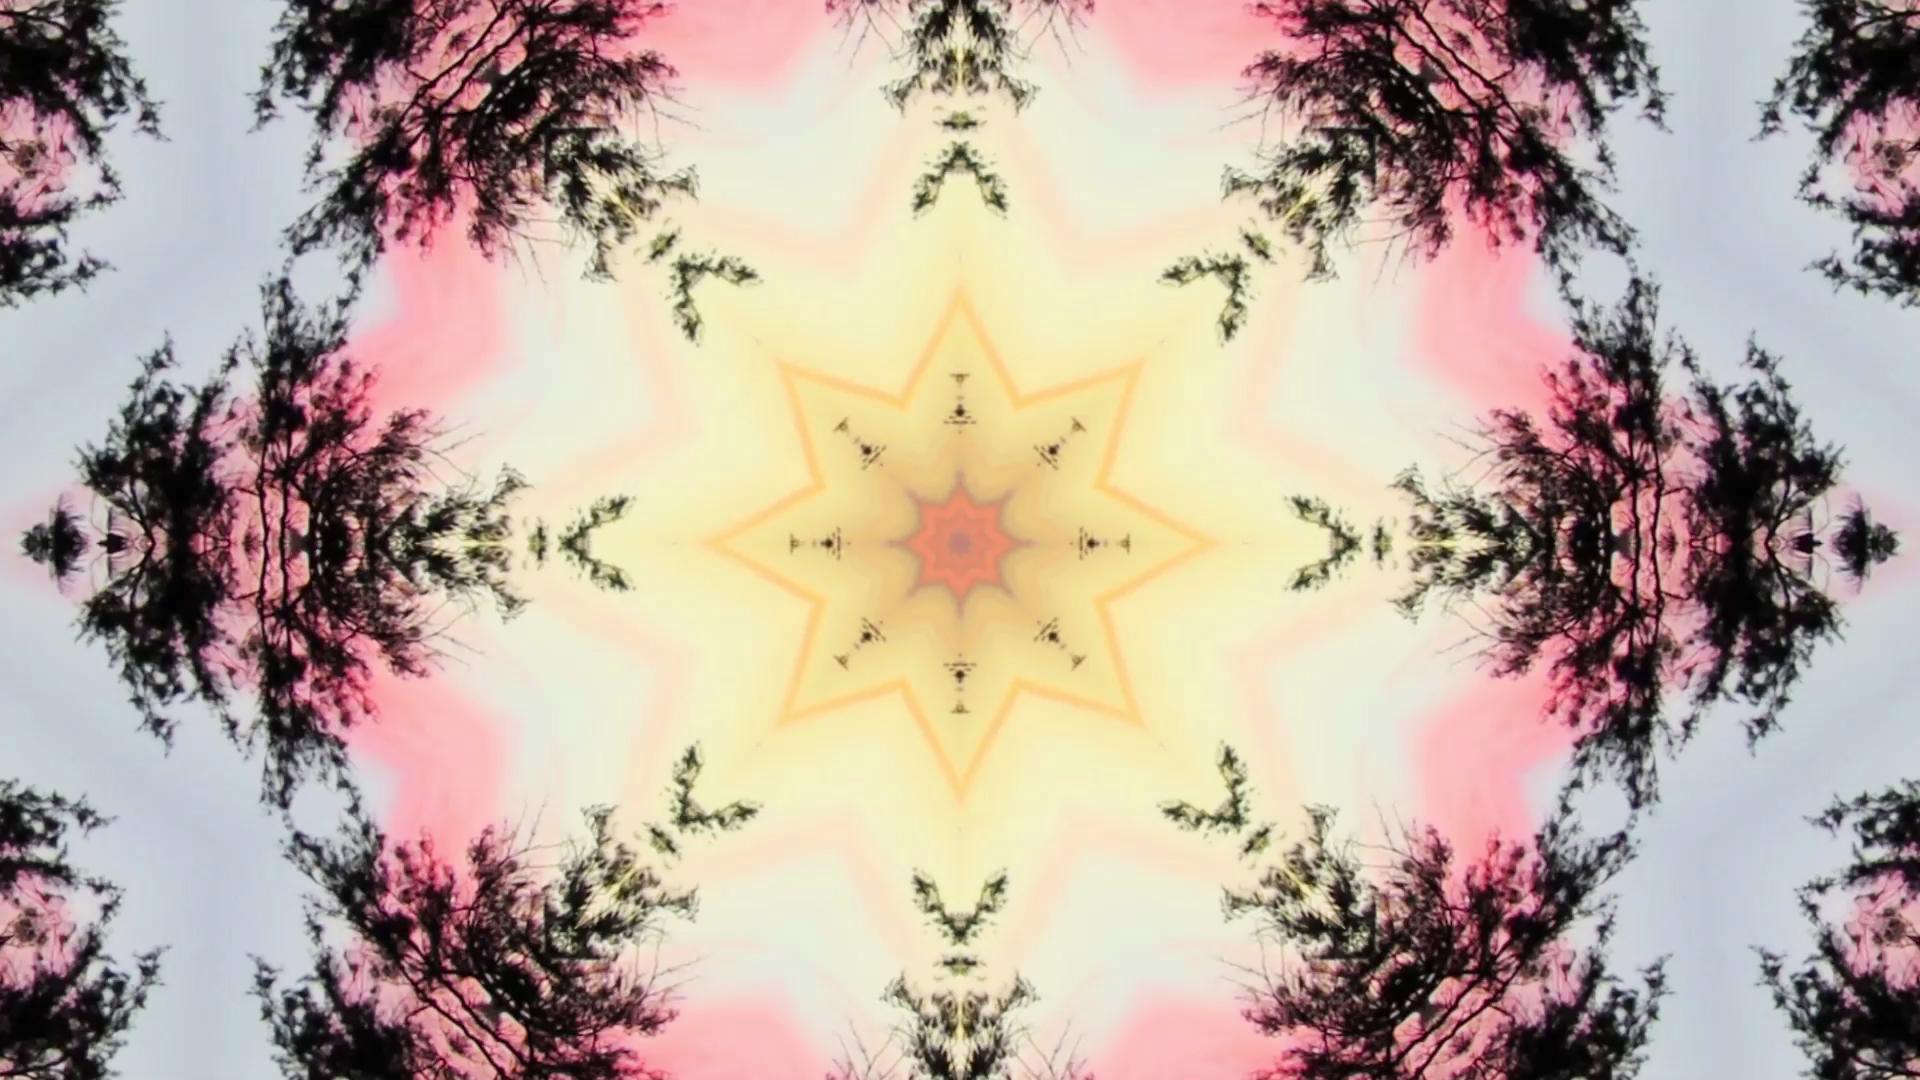 Ann Spalter  Bora Bora: Sunset, 1080p HD digital video, 3min. 2013